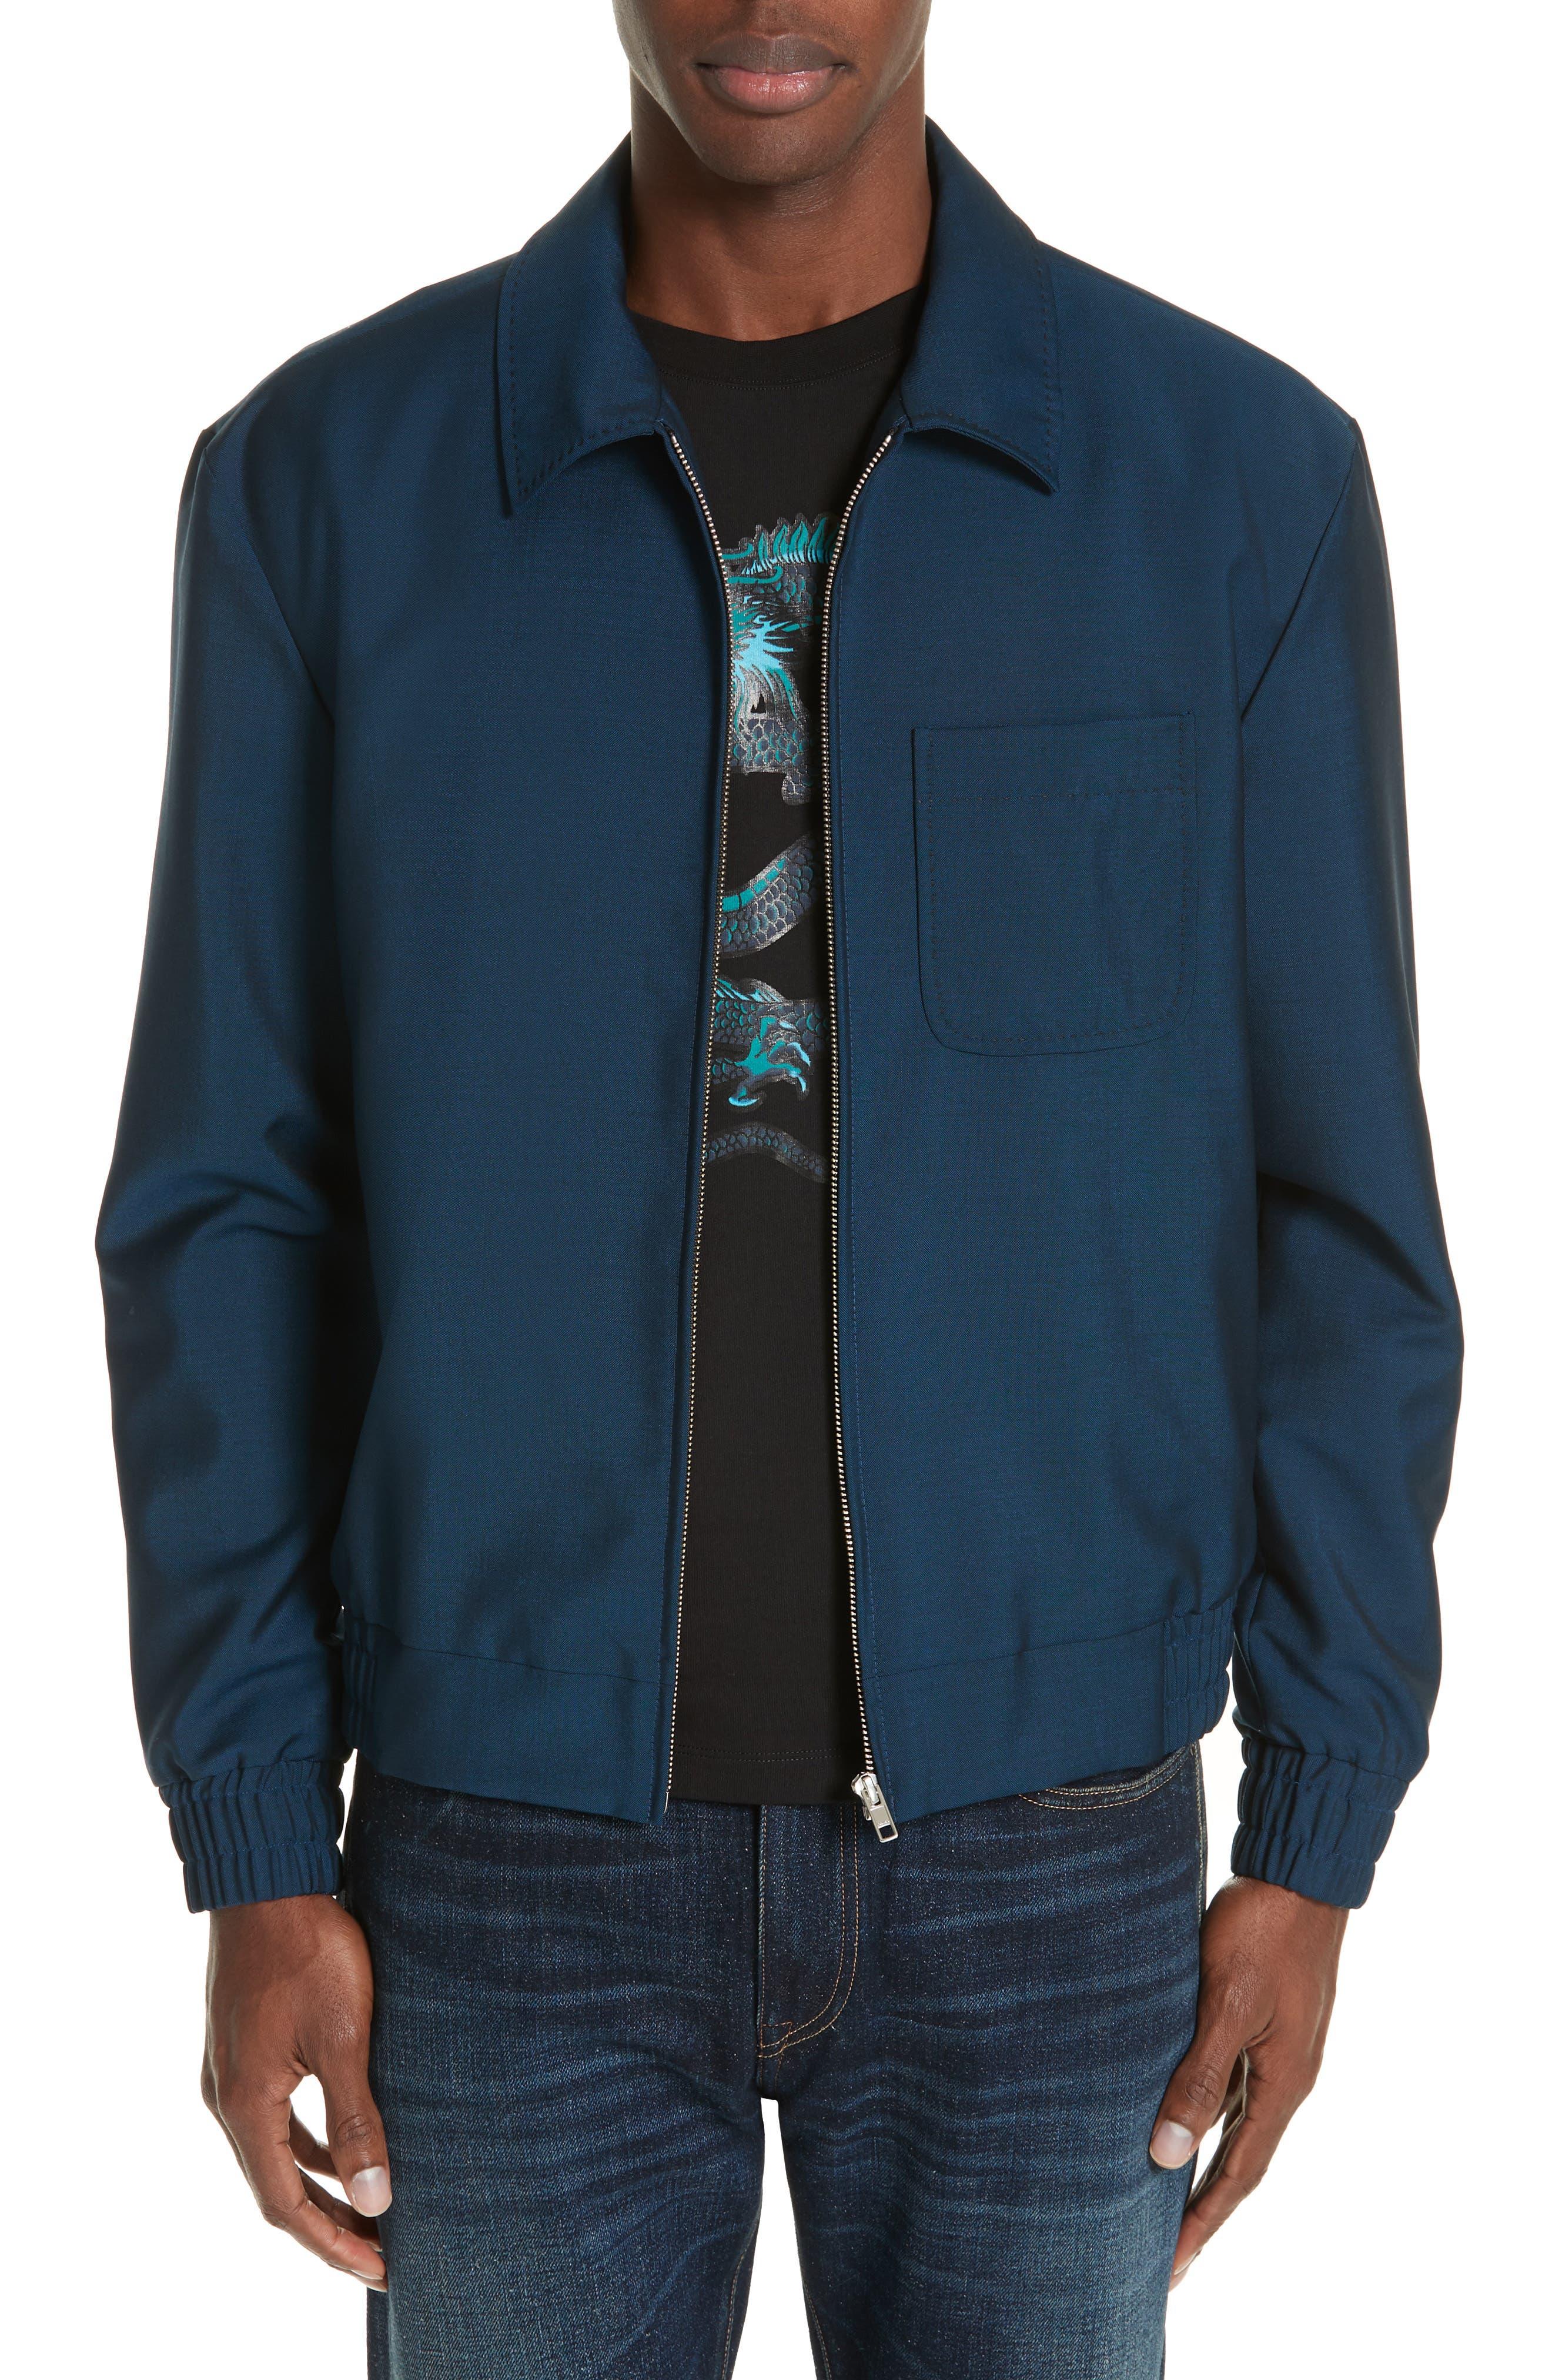 KENZO, Zip Jacket, Main thumbnail 1, color, DUCK BLUE